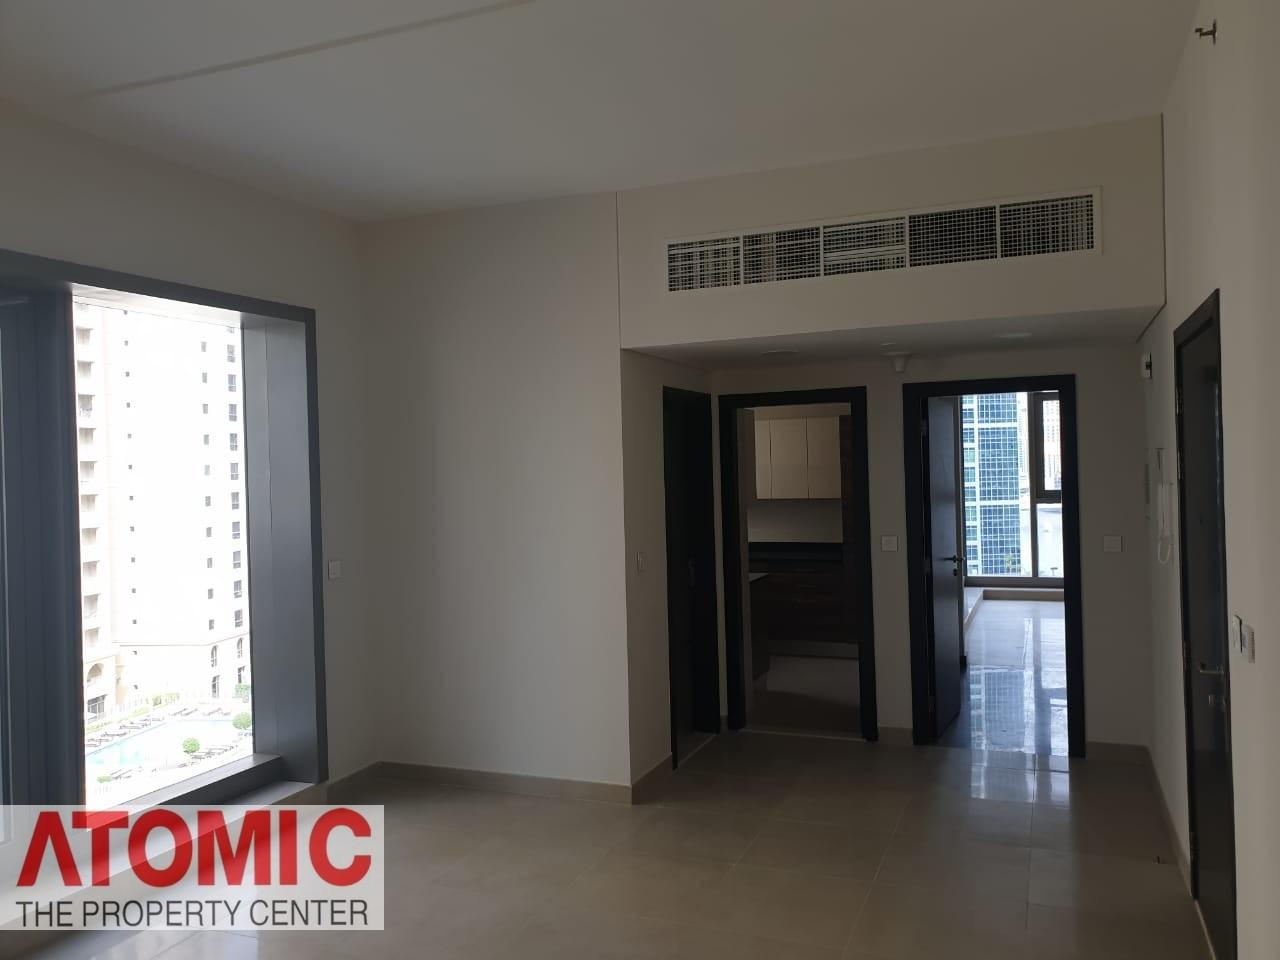 1 Bedroom |2 Balcony |Mid-Floor | Sparkle Towers